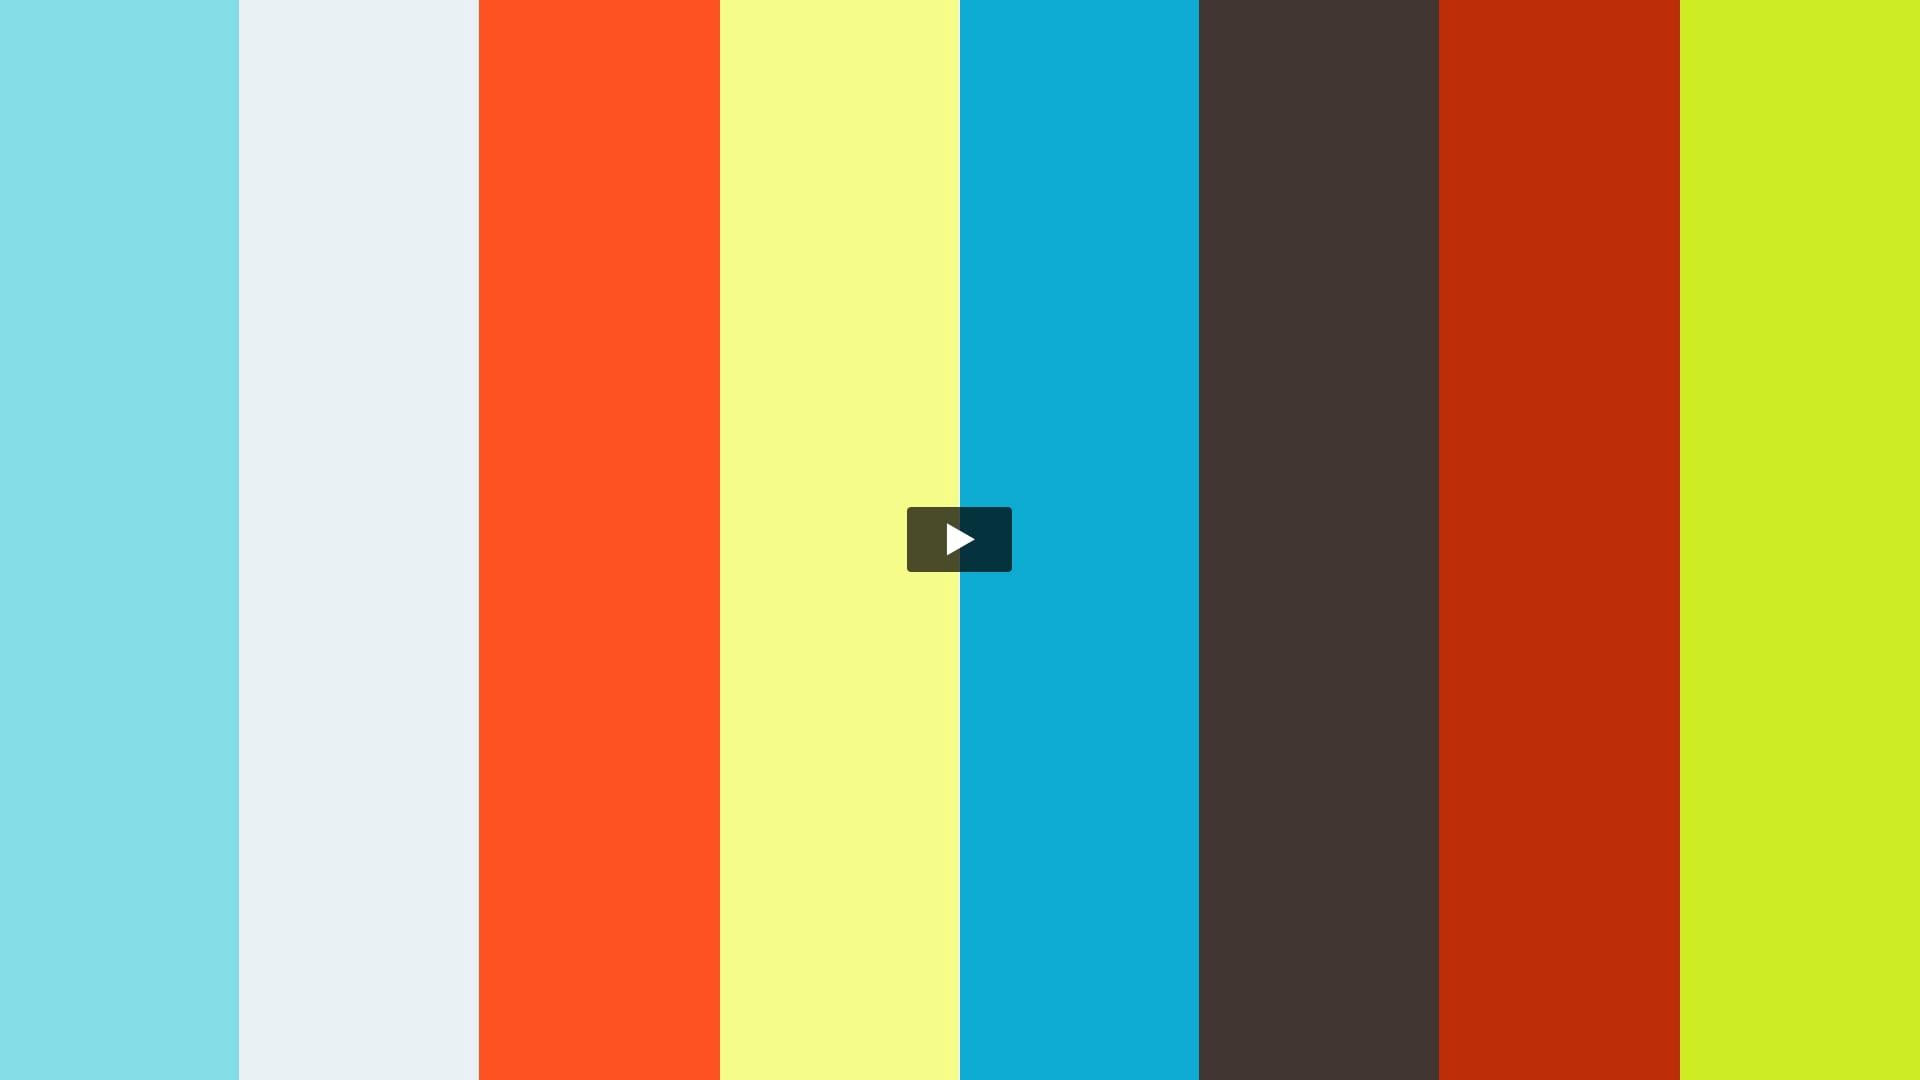 Mentawais - Pixel 2